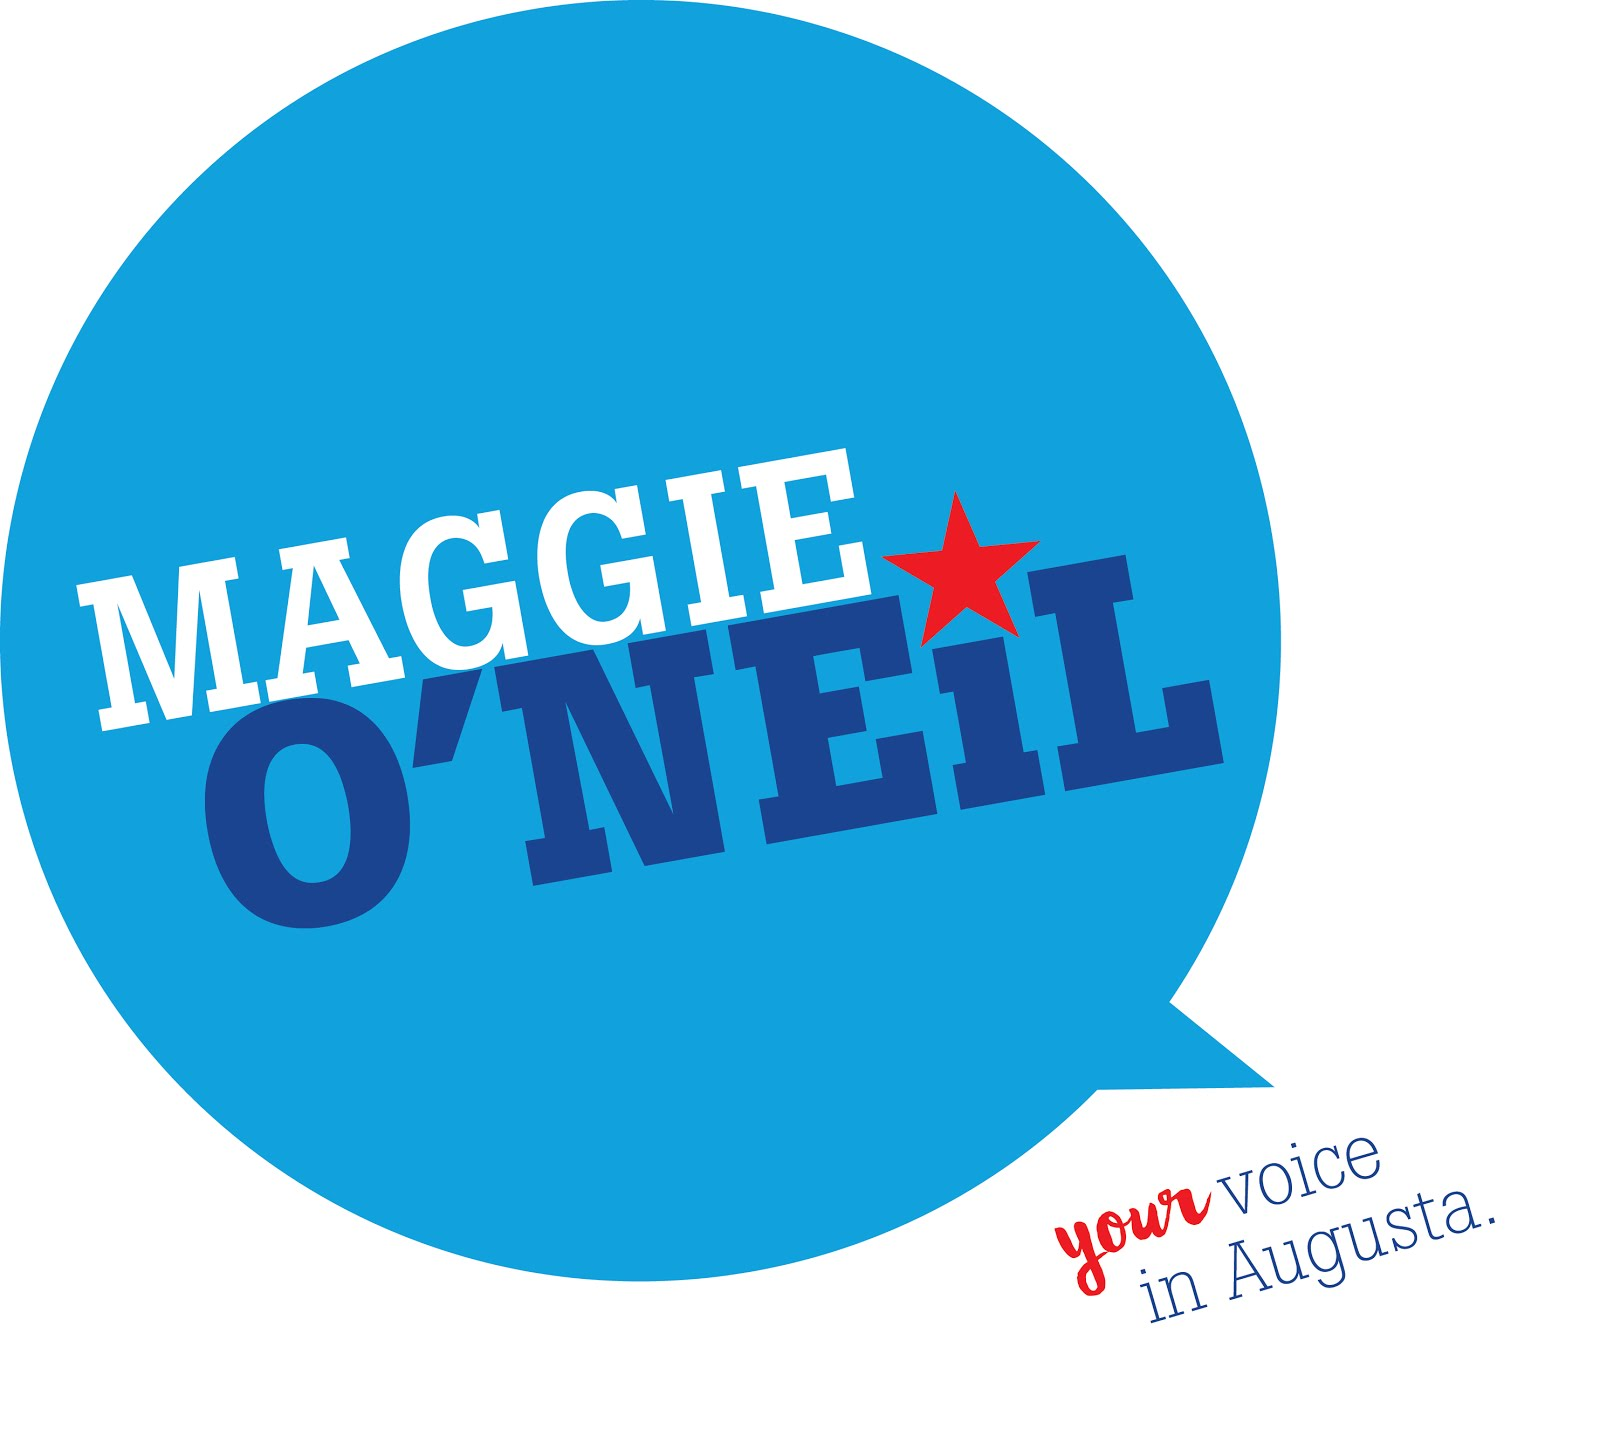 Maine Democrat Maggie!